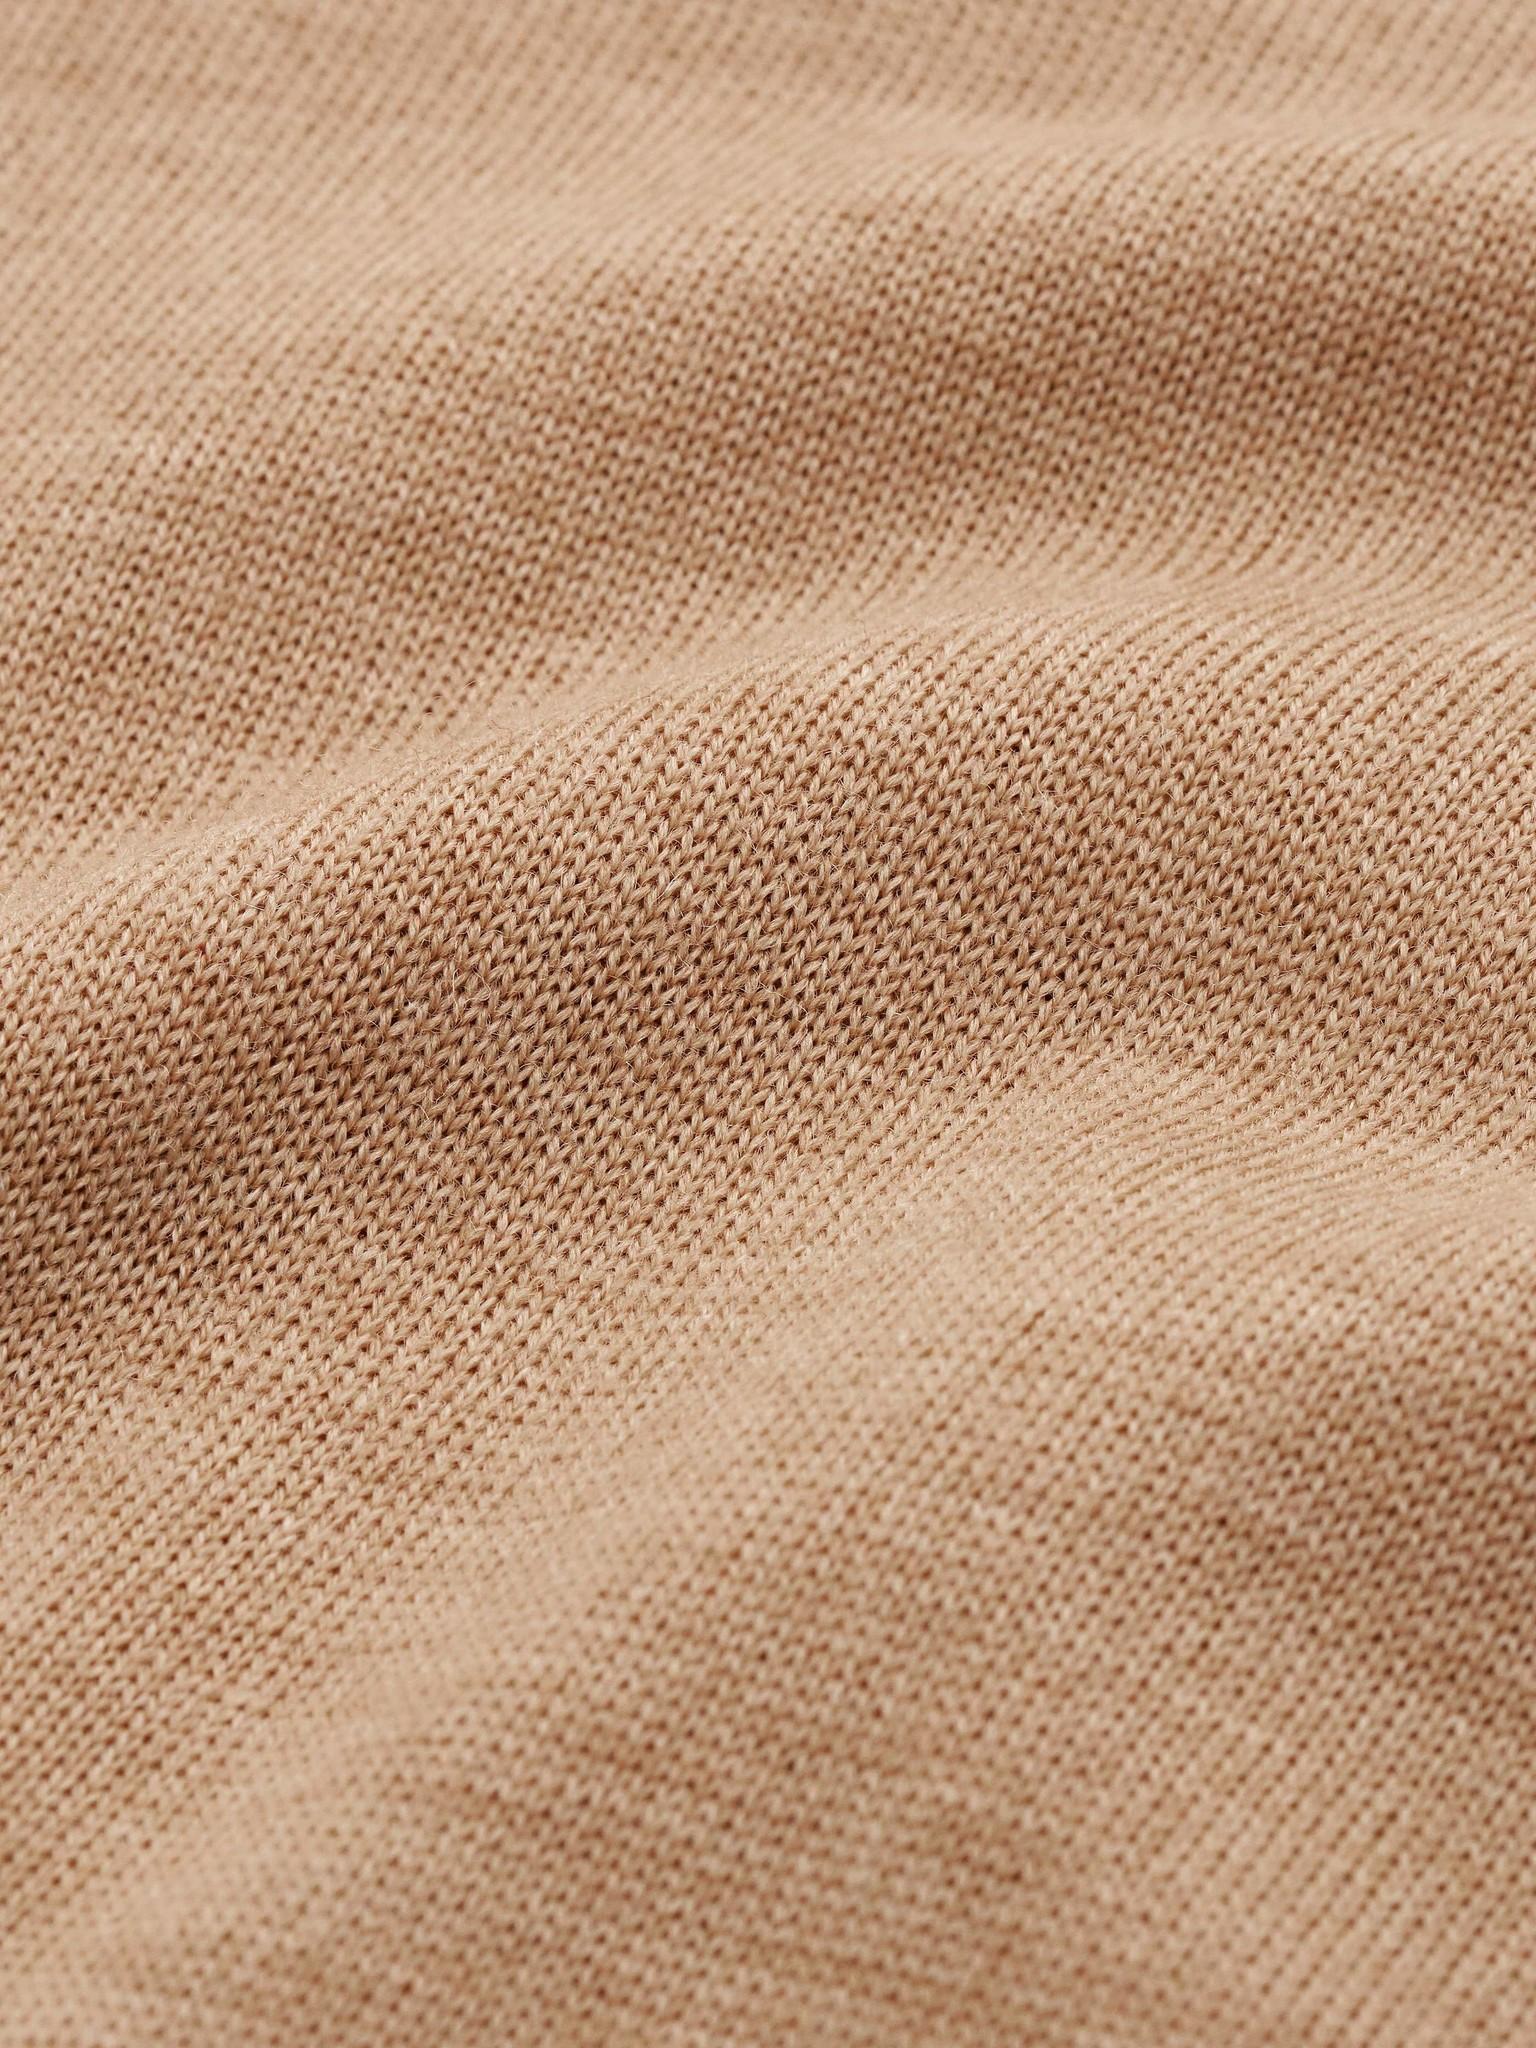 Nevile Macchiato Brown Turtle Neck Wool-3